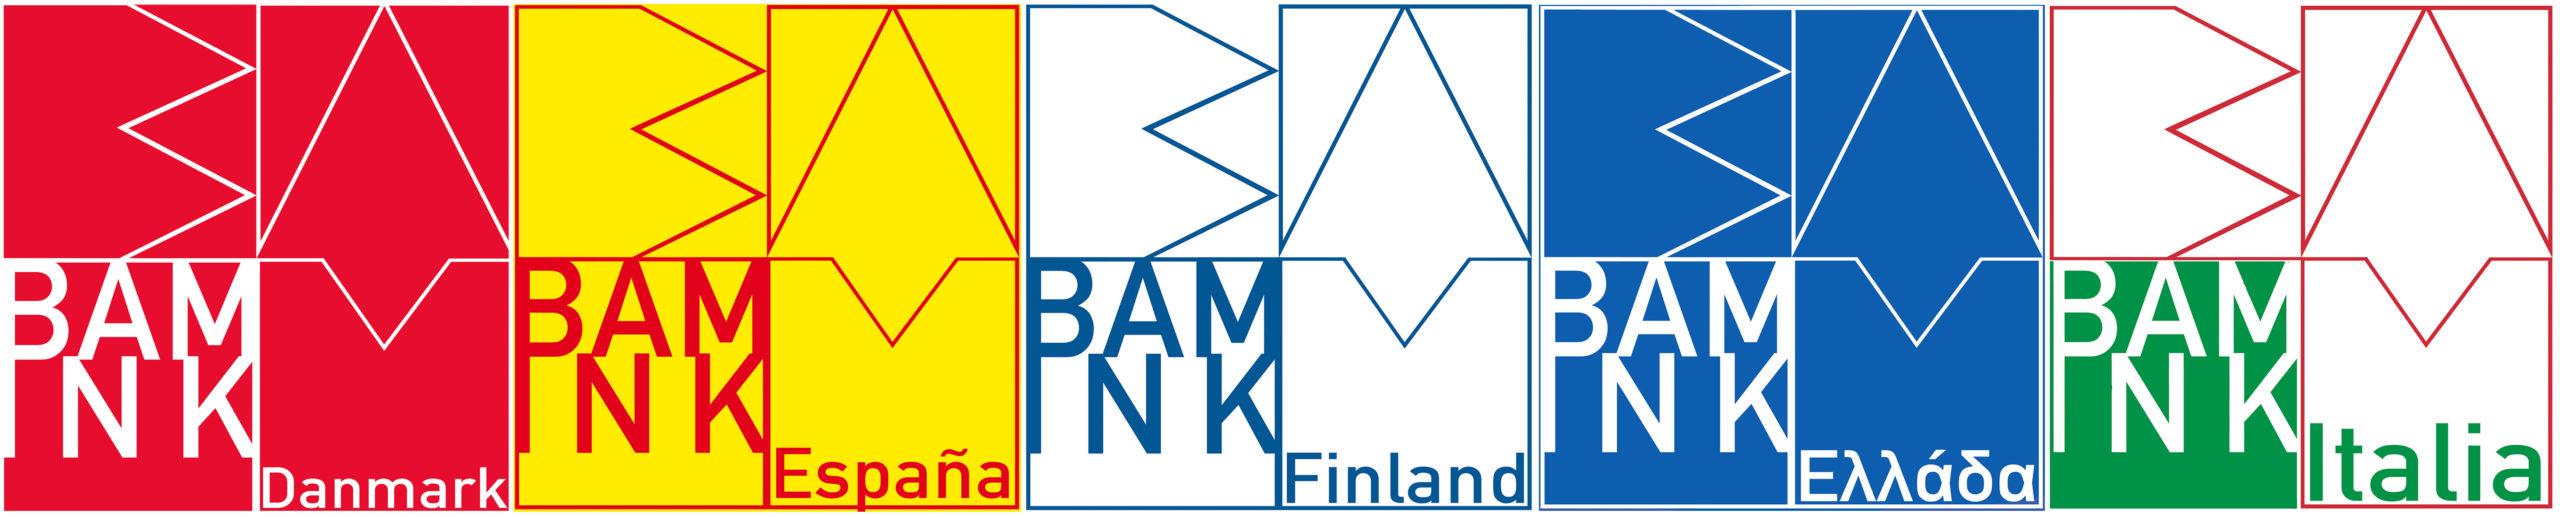 Delivery - Denmark - Spain - Finland - Greece - Italy